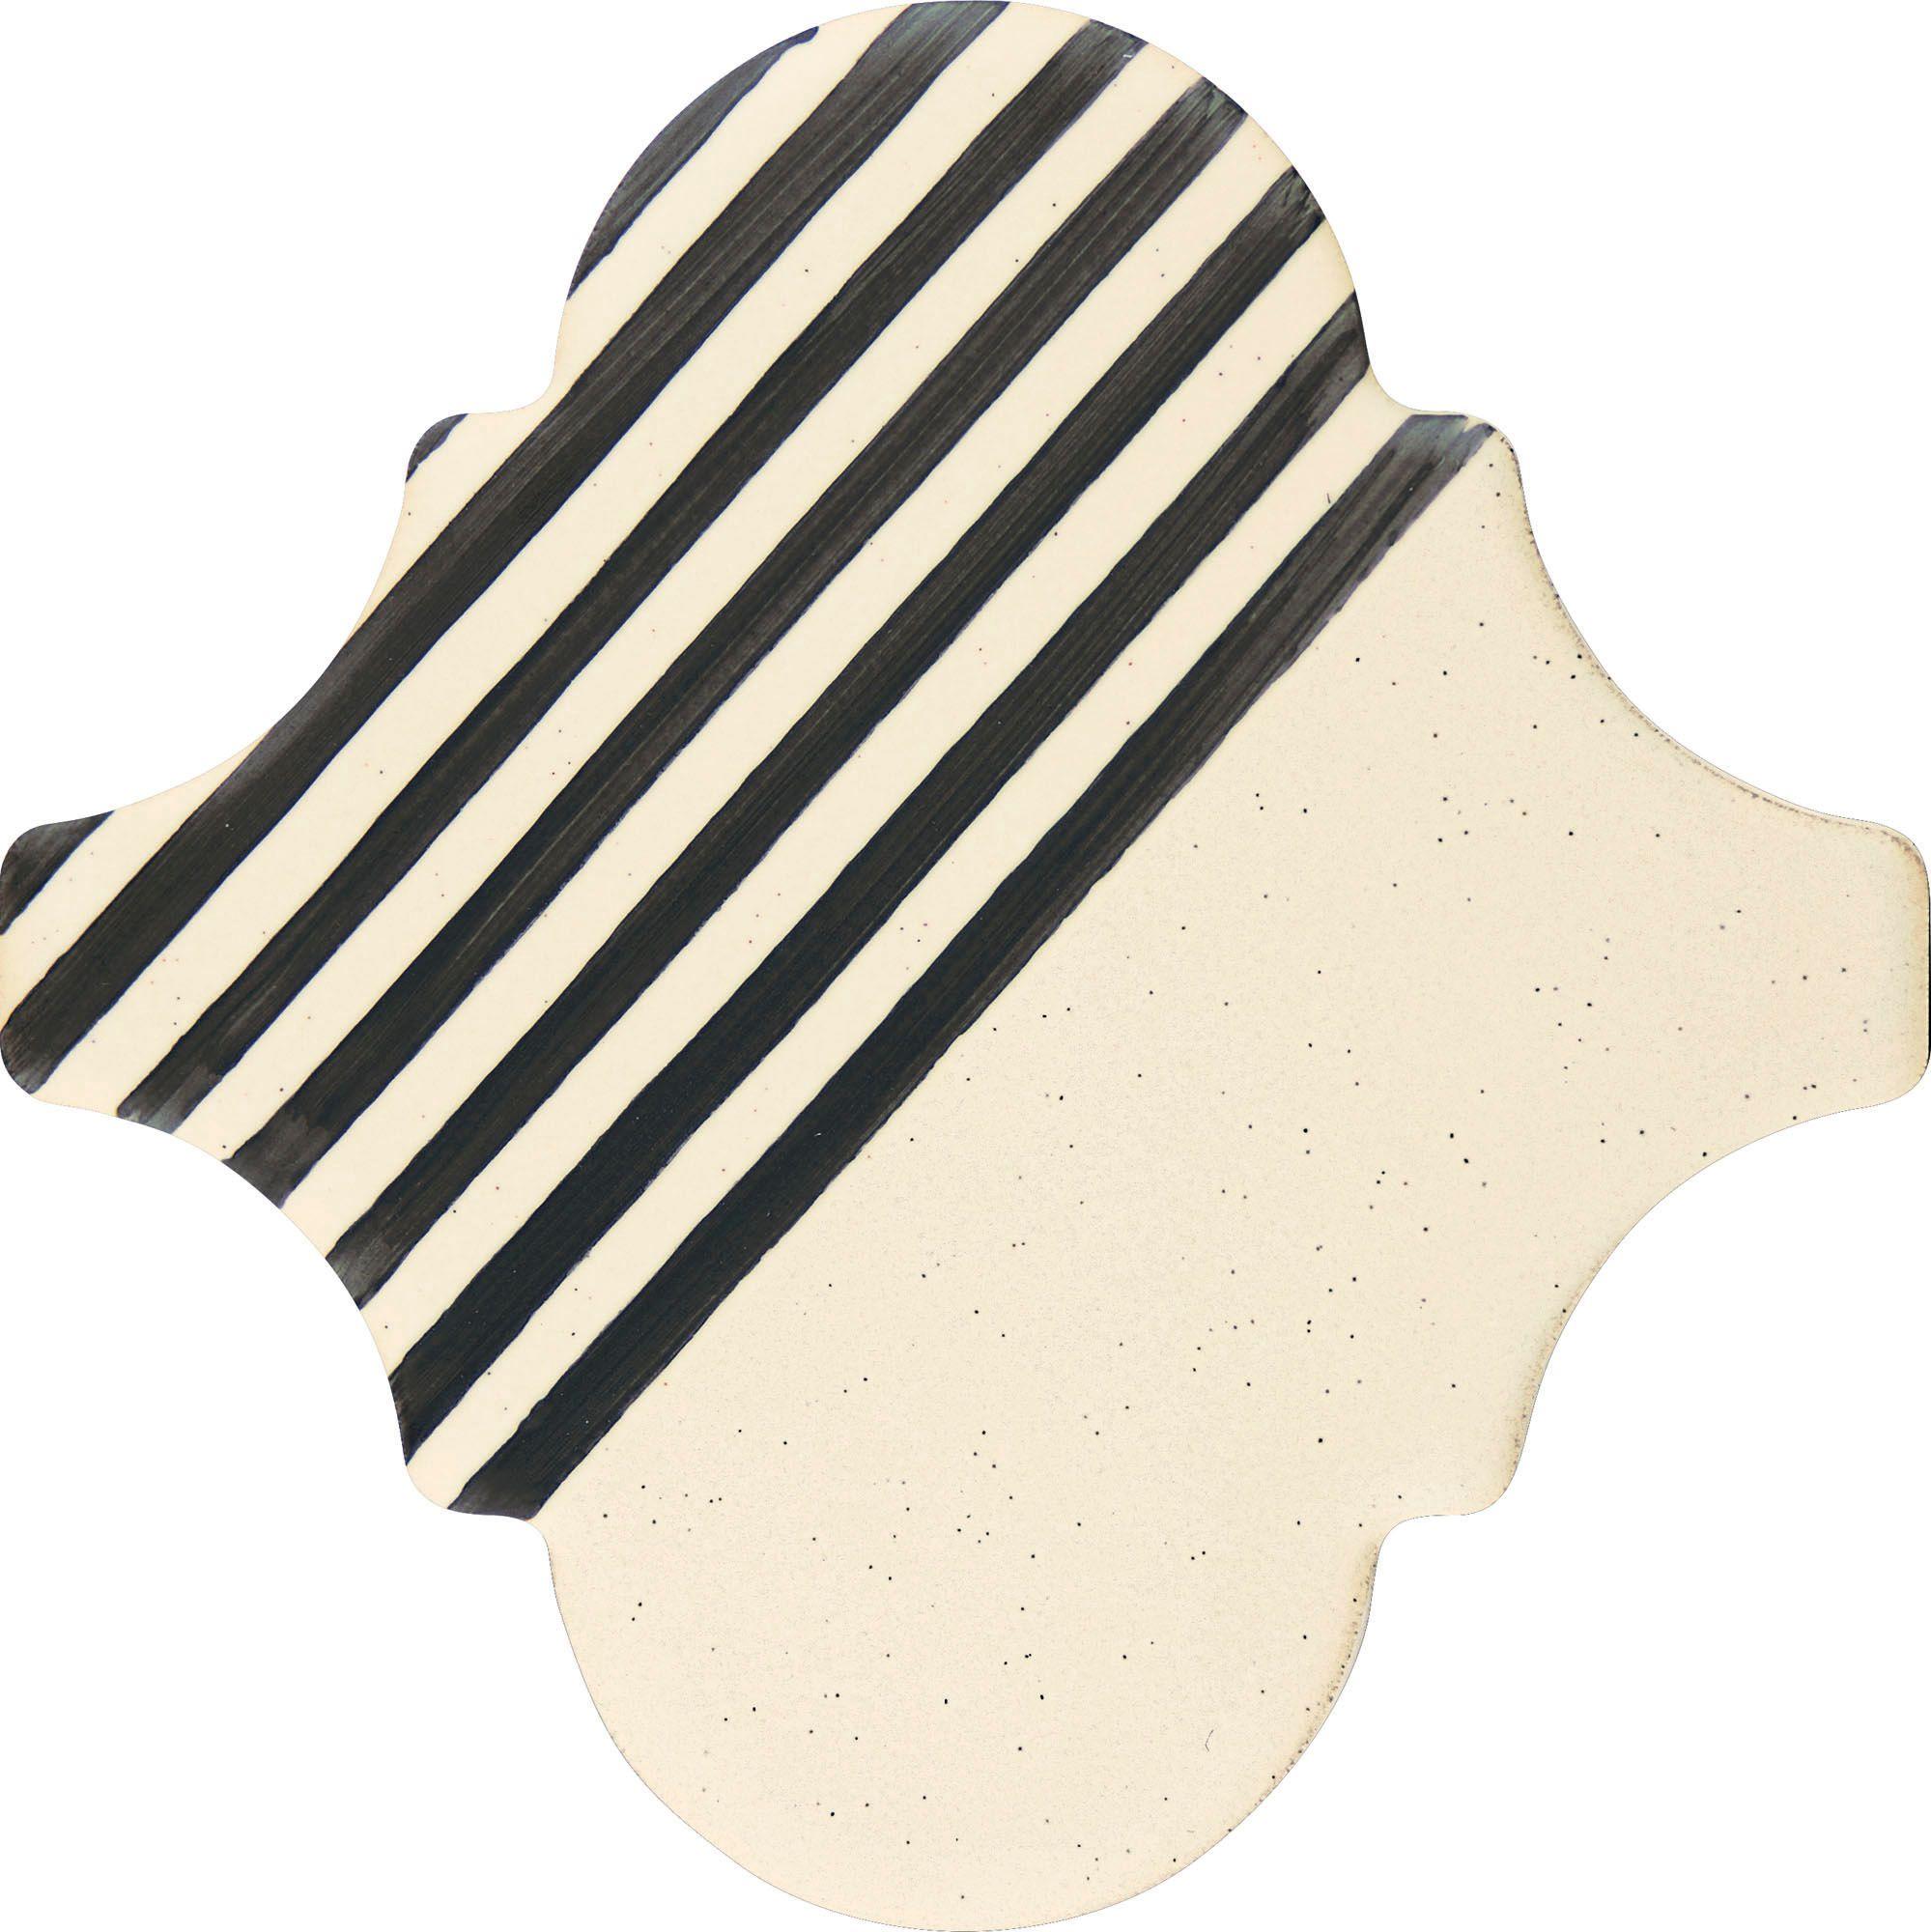 PF007 Color Art White Stripes Arabesque